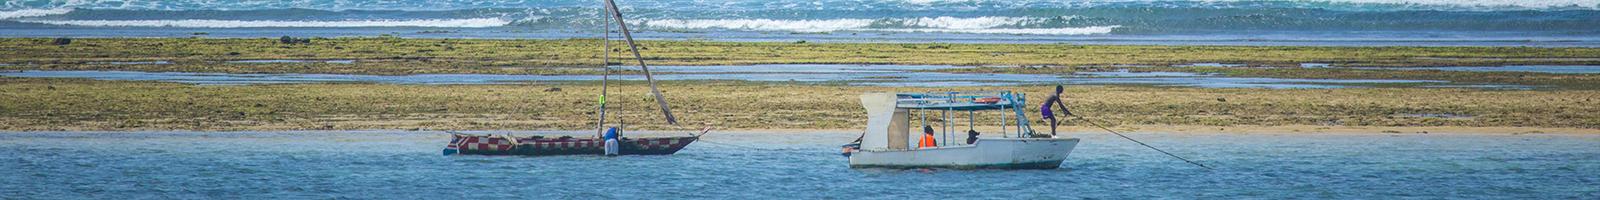 Two fishing boats in the lagoon at Nyali Beach, Mombasa